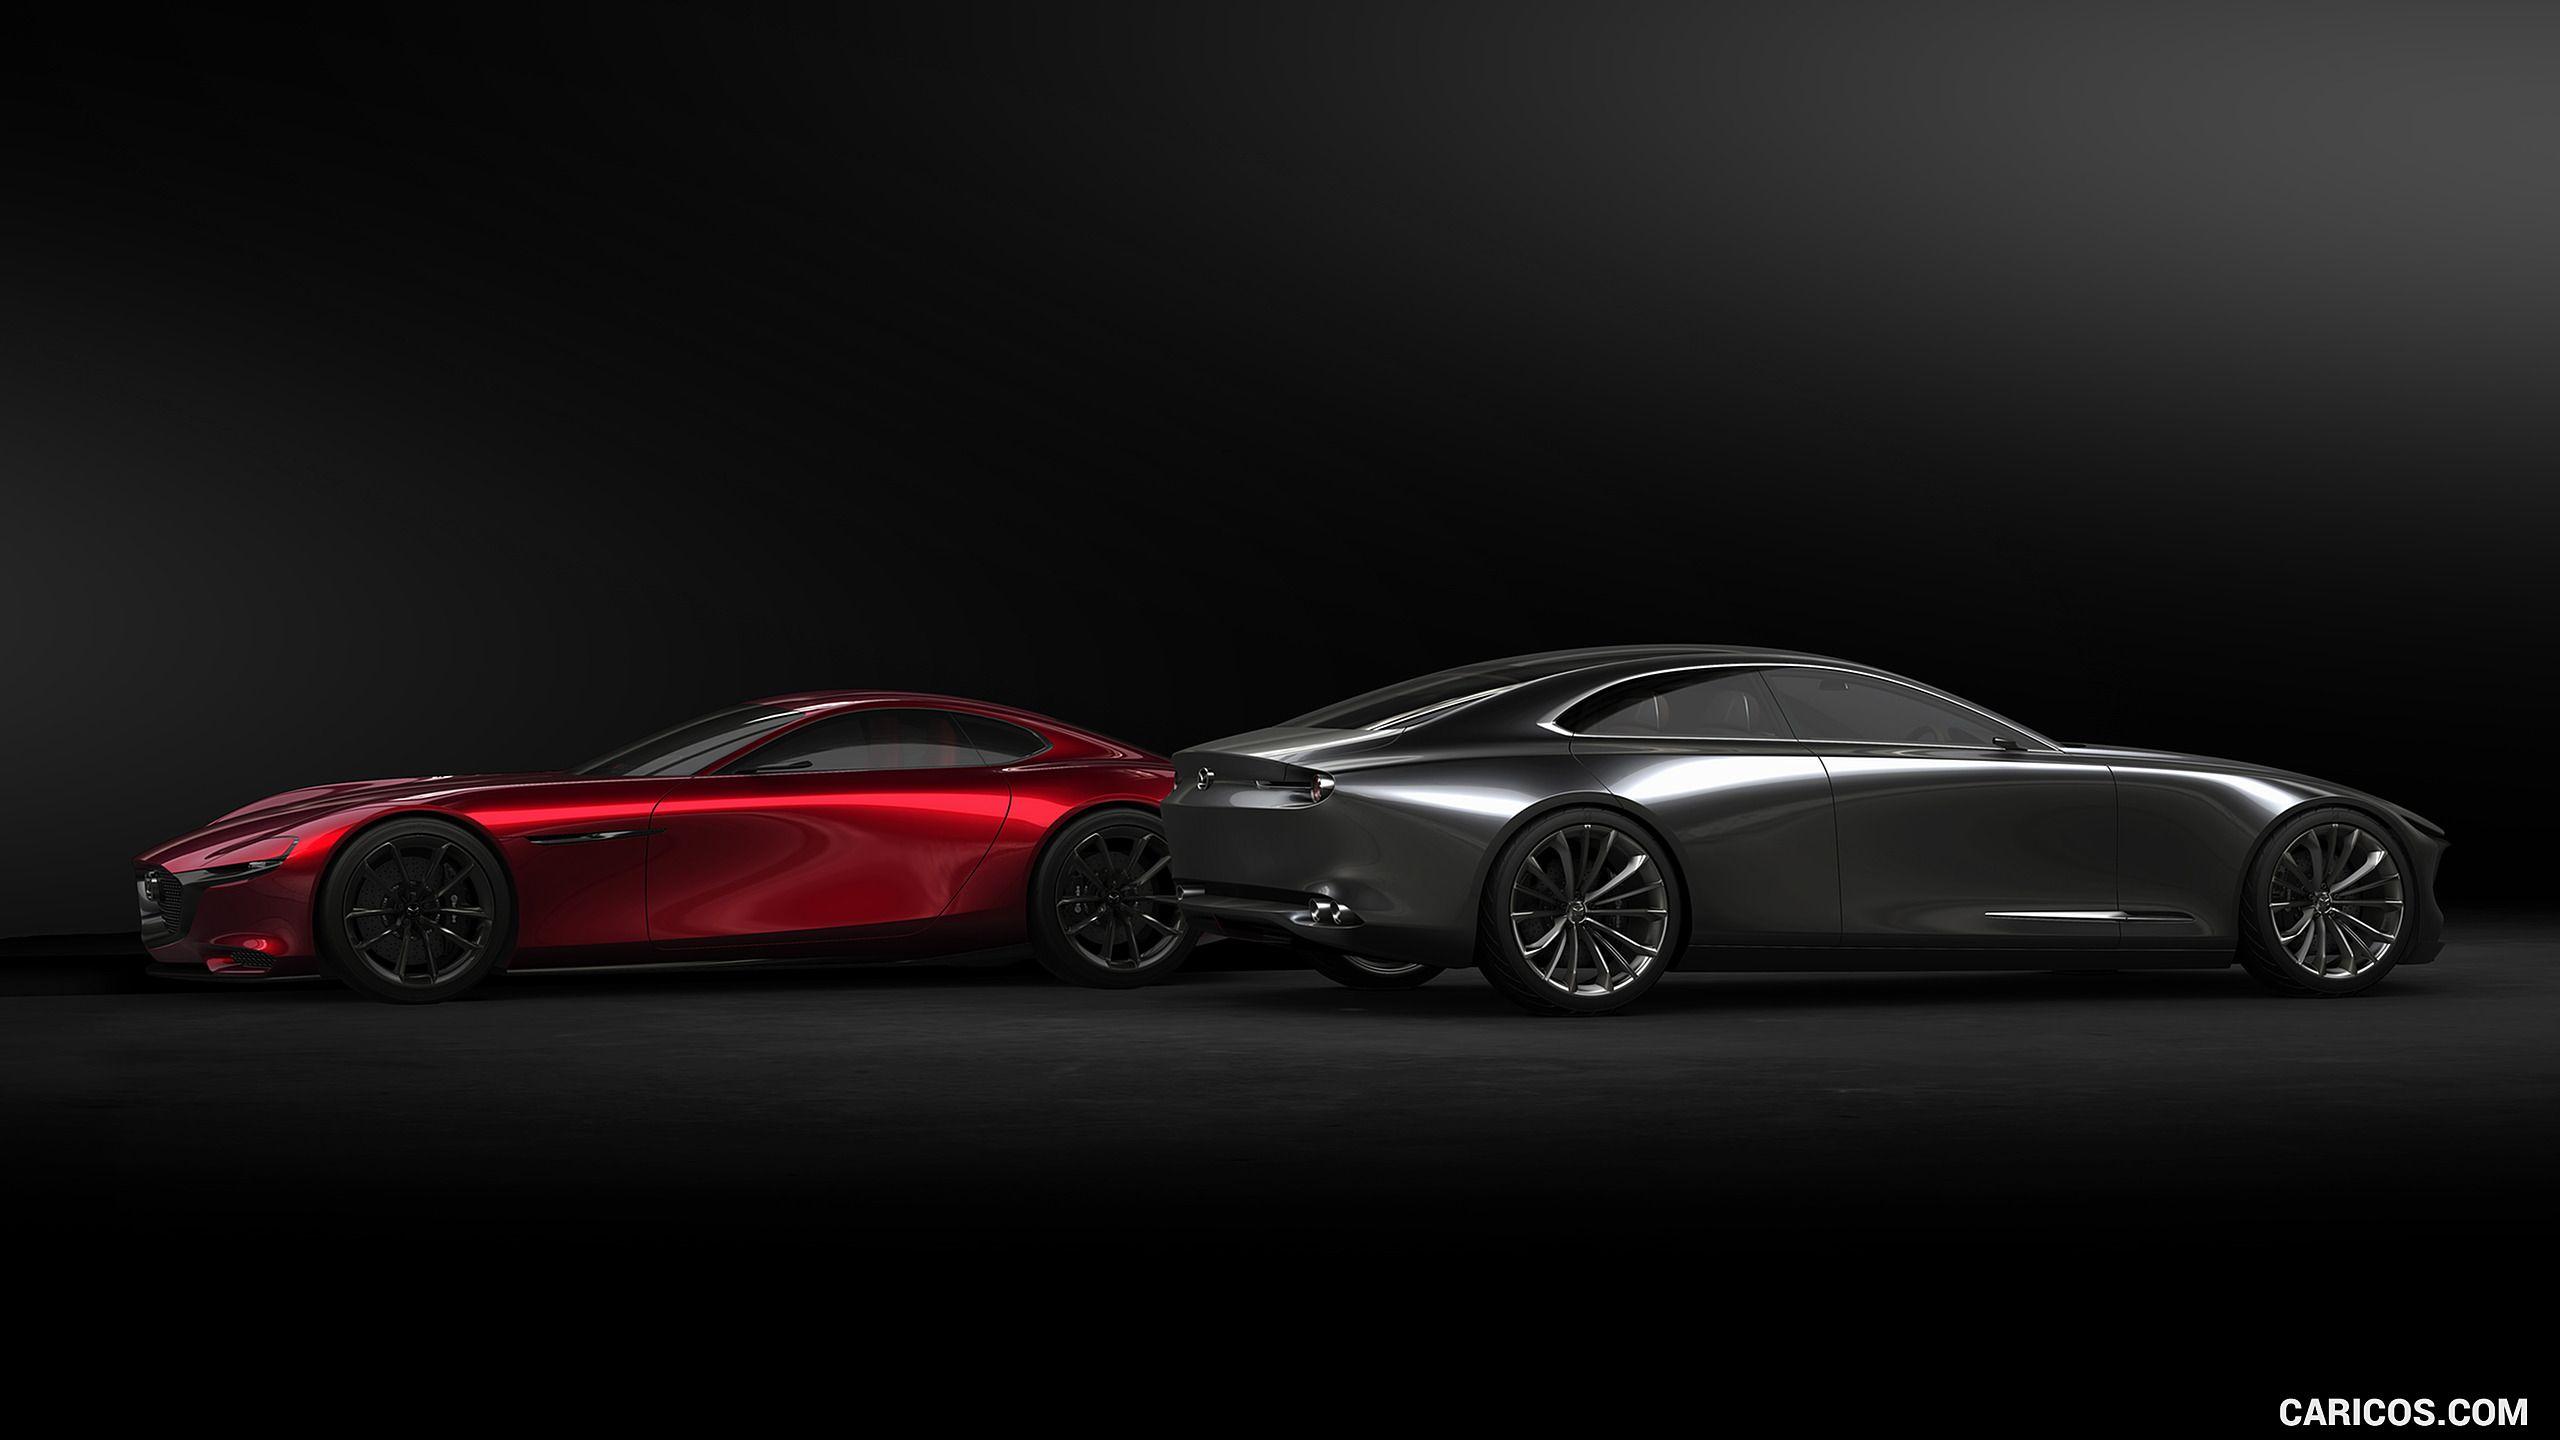 2017 Mazda KAI Concept HD | conseptcar | Pinterest | Mazda and Cars